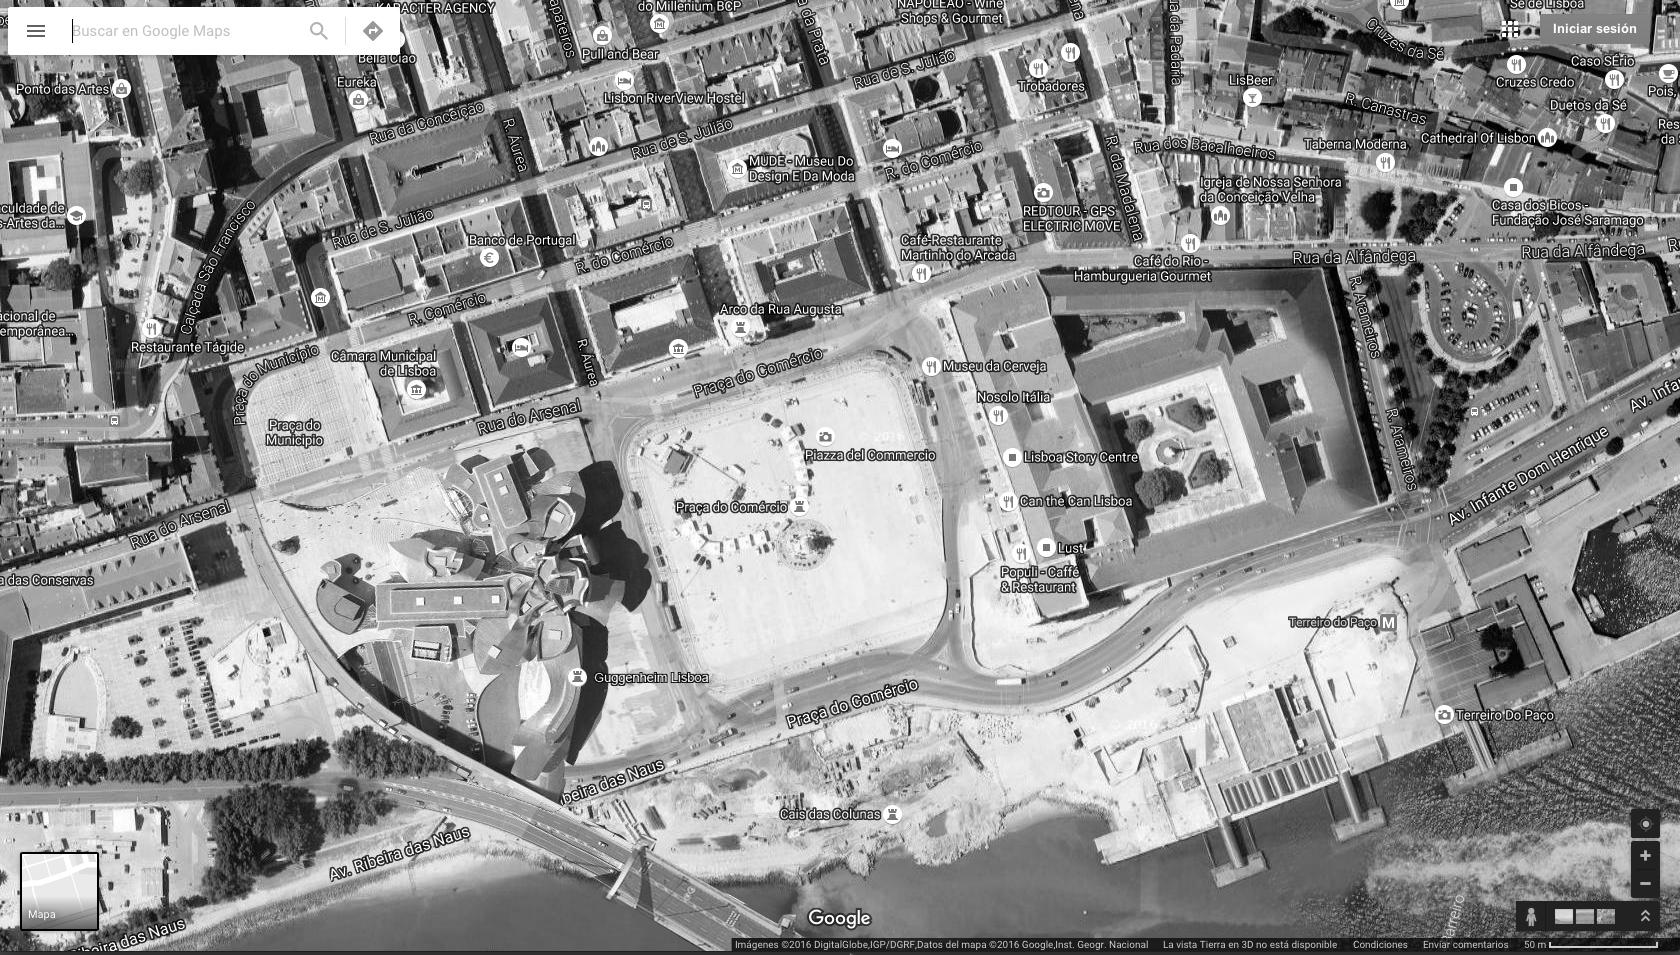 Google Maps Screenshot of the surroundings of Guggenheim Lisbon at Praça do Comercio